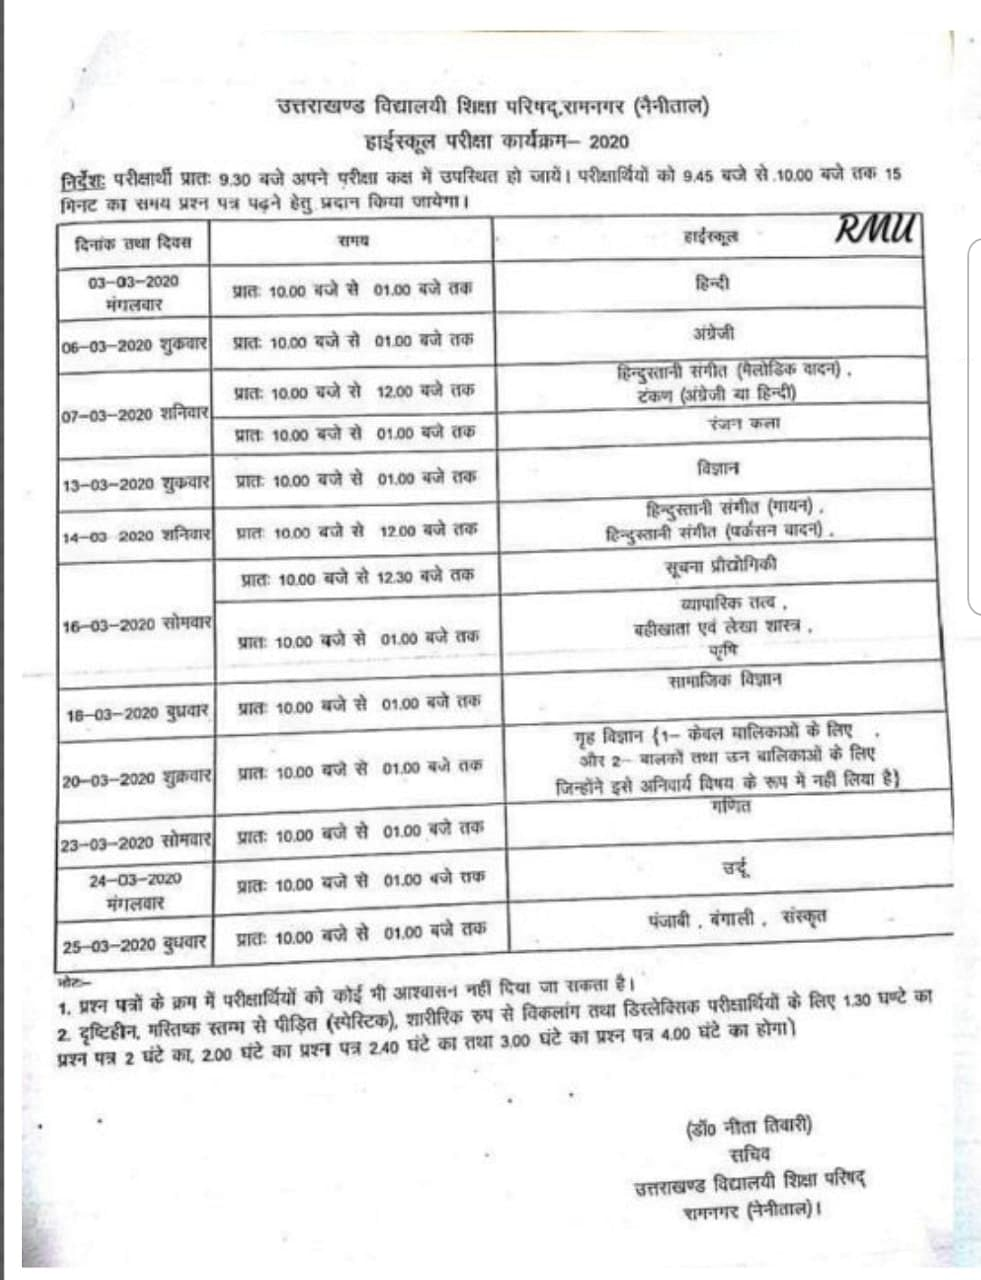 Uttarakhand Board Class 10 Datesheet